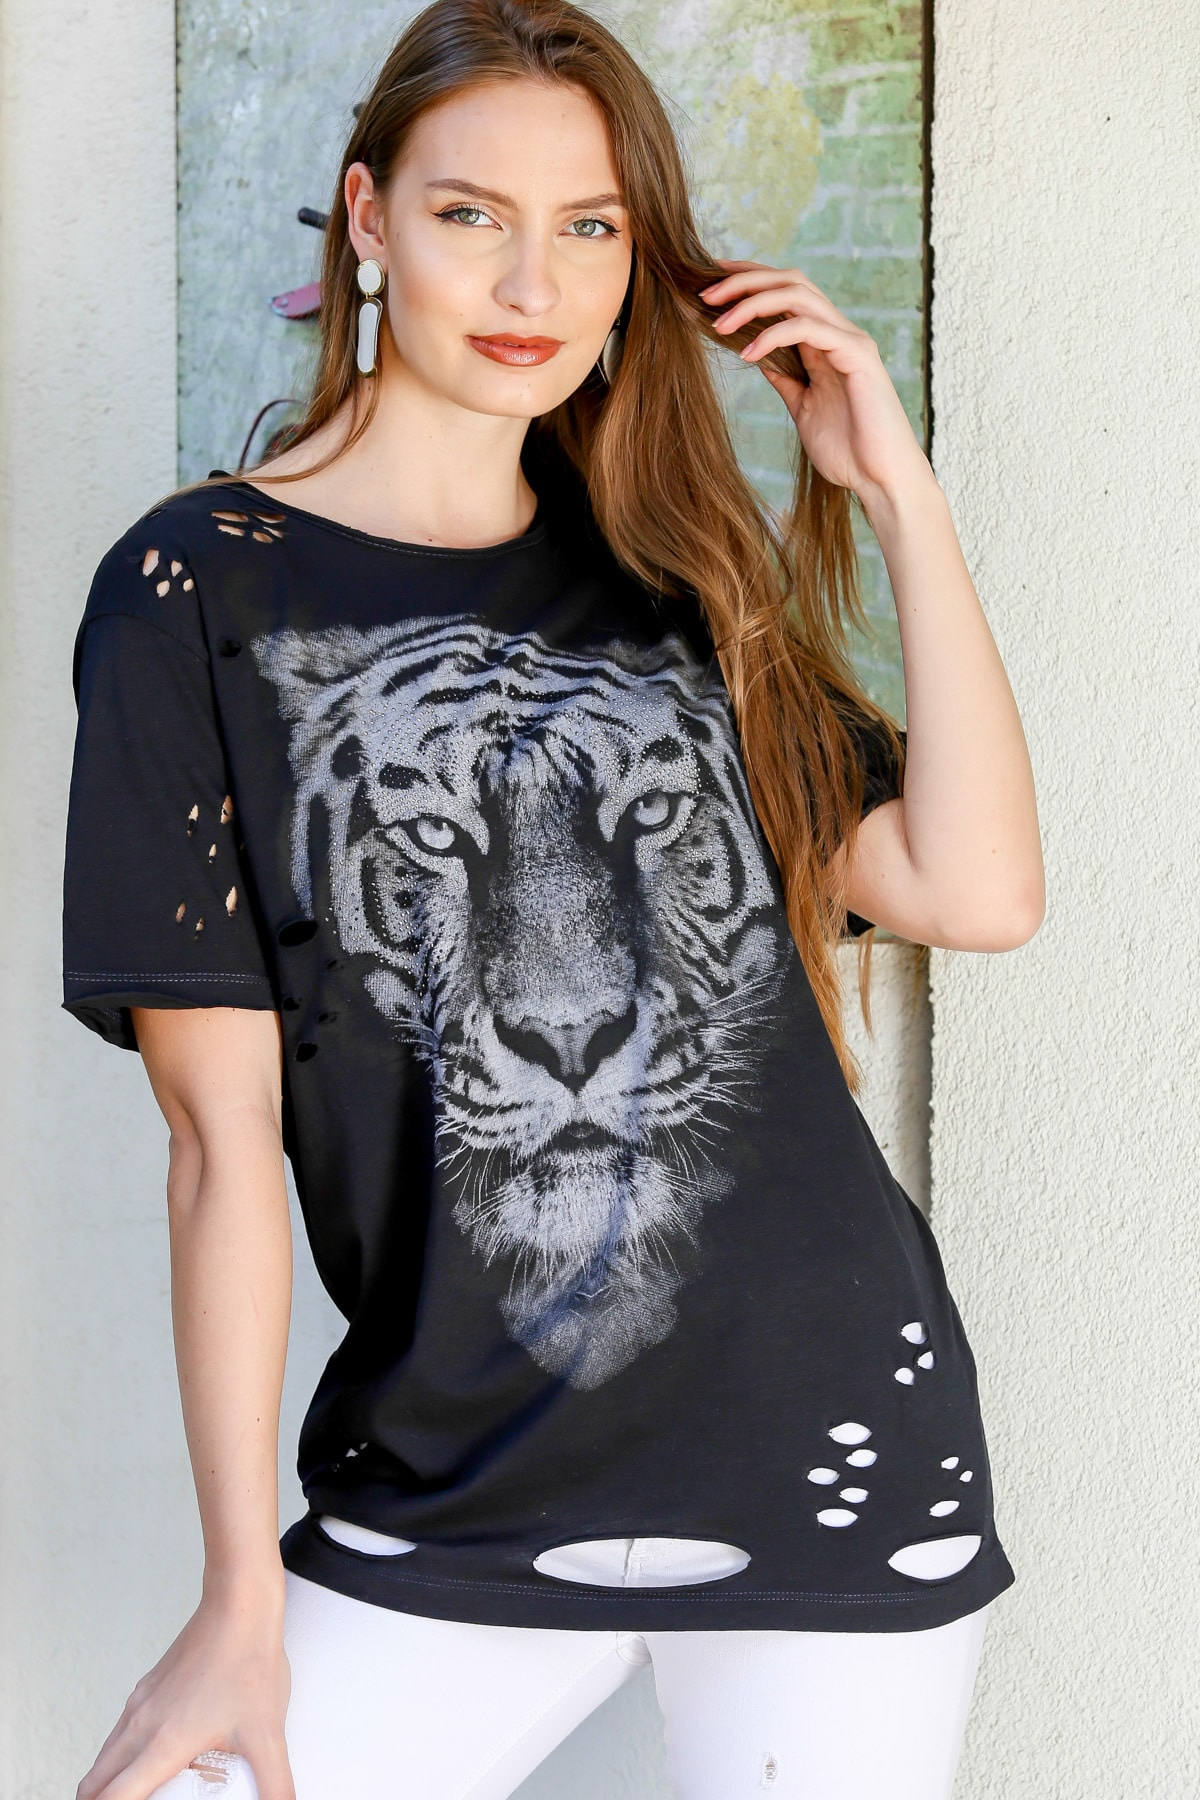 Chiccy Kadın Siyah Sıfır Yaka Kaplan Baskılı Stut Detaylı Lazer Kesikli Yıkamalı T-Shirt  M10010300TS98220